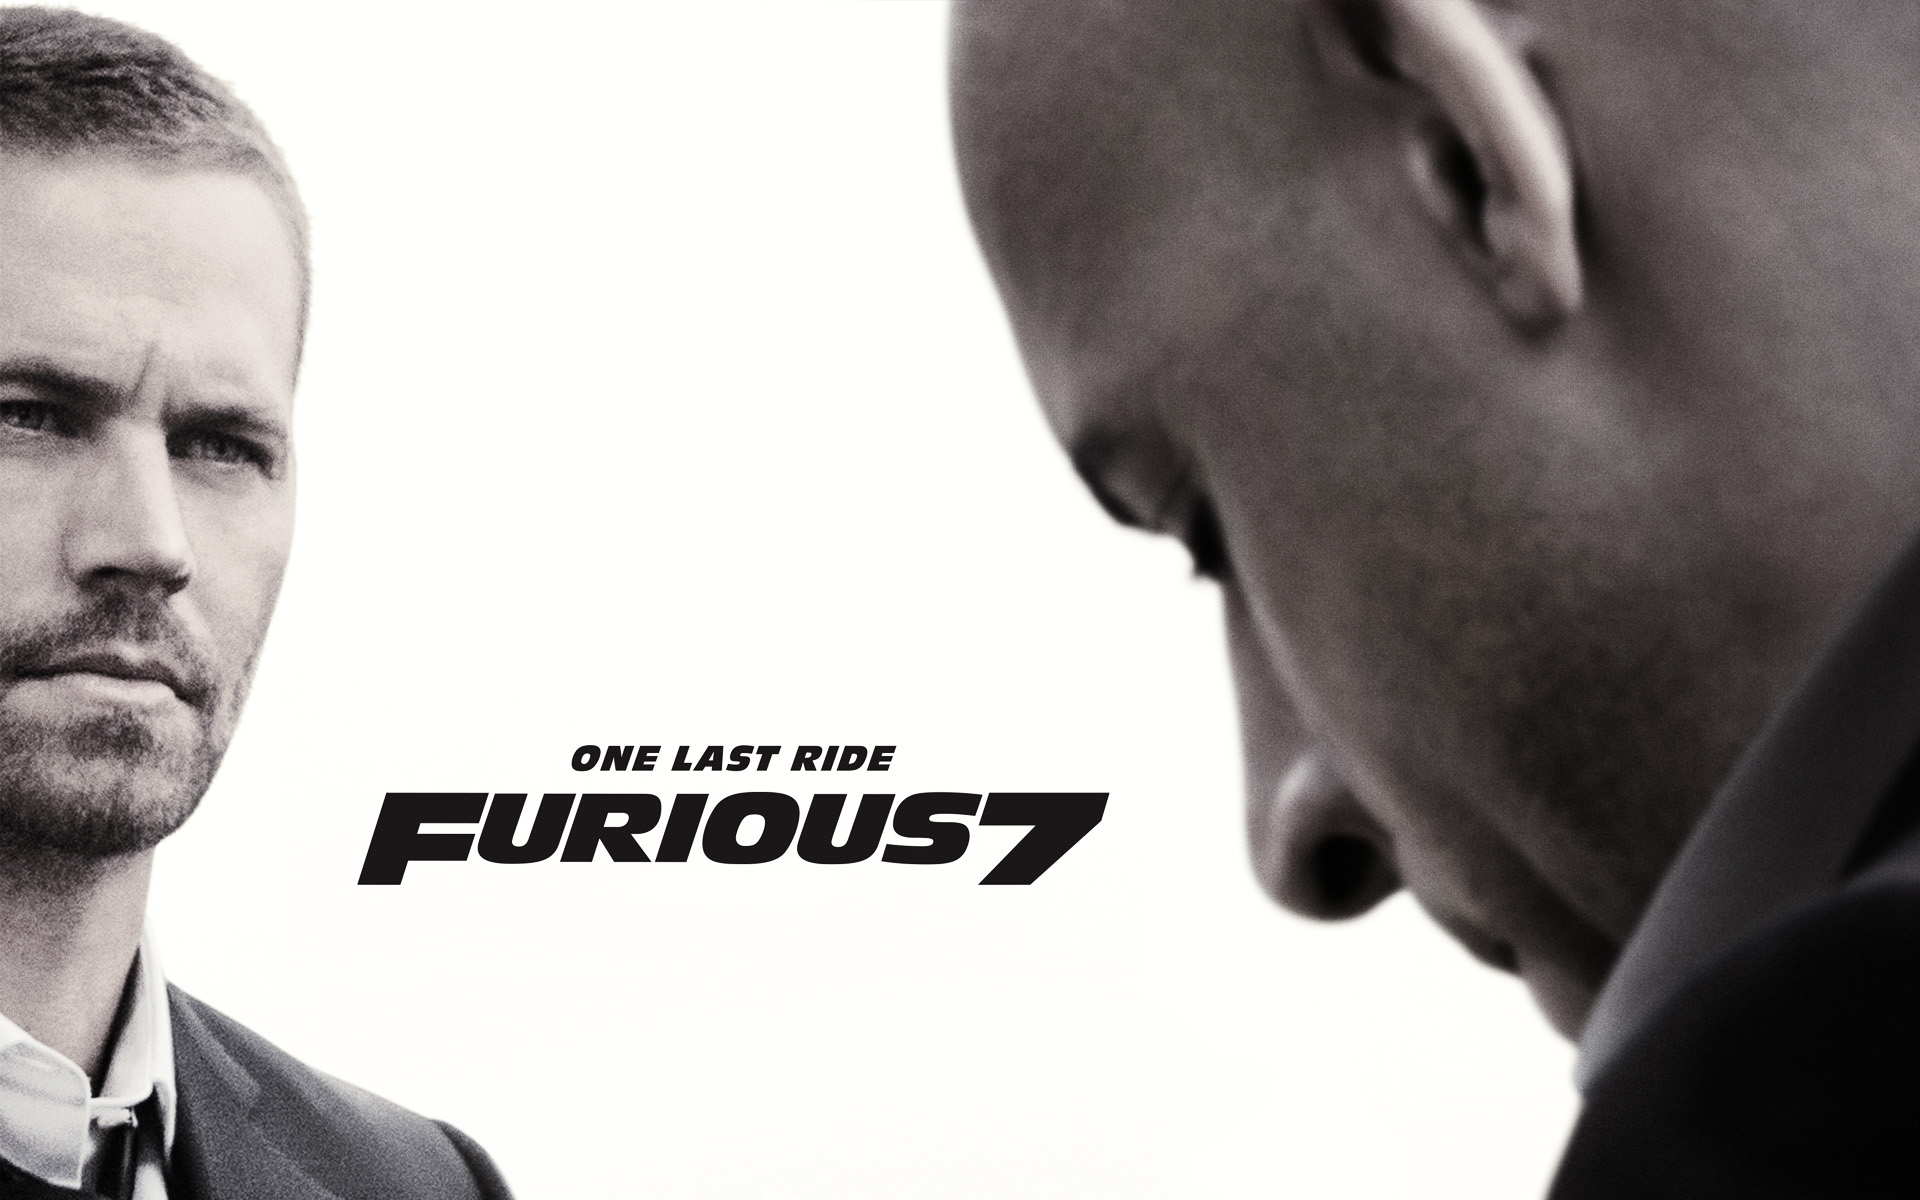 Free Download Konu Hzl Ve Fkeli 7 Resimleri Fast Furious 7